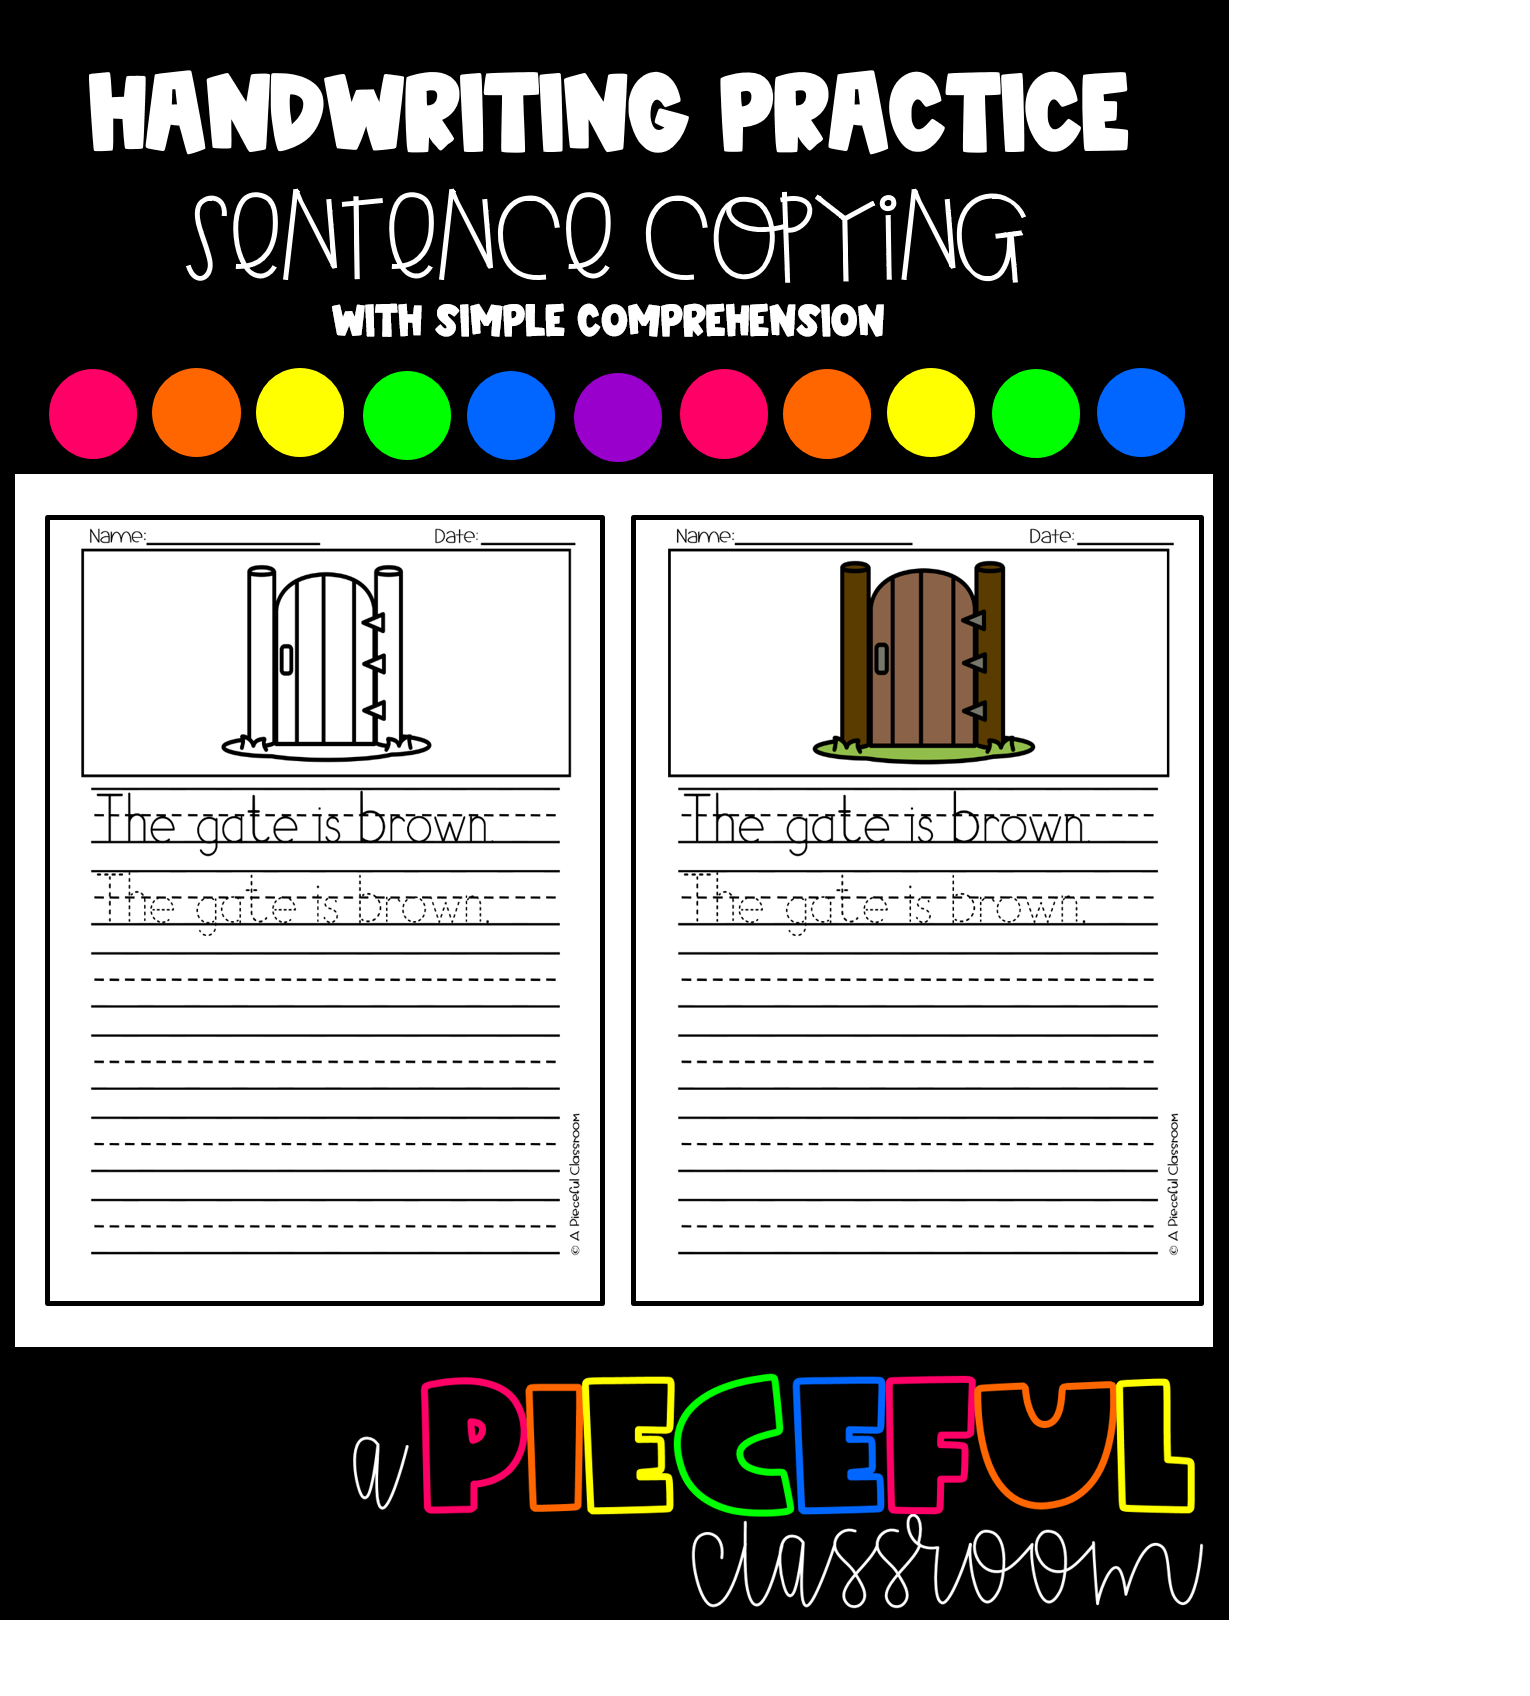 Sentence Copying Handwriting Practice Amp Simple